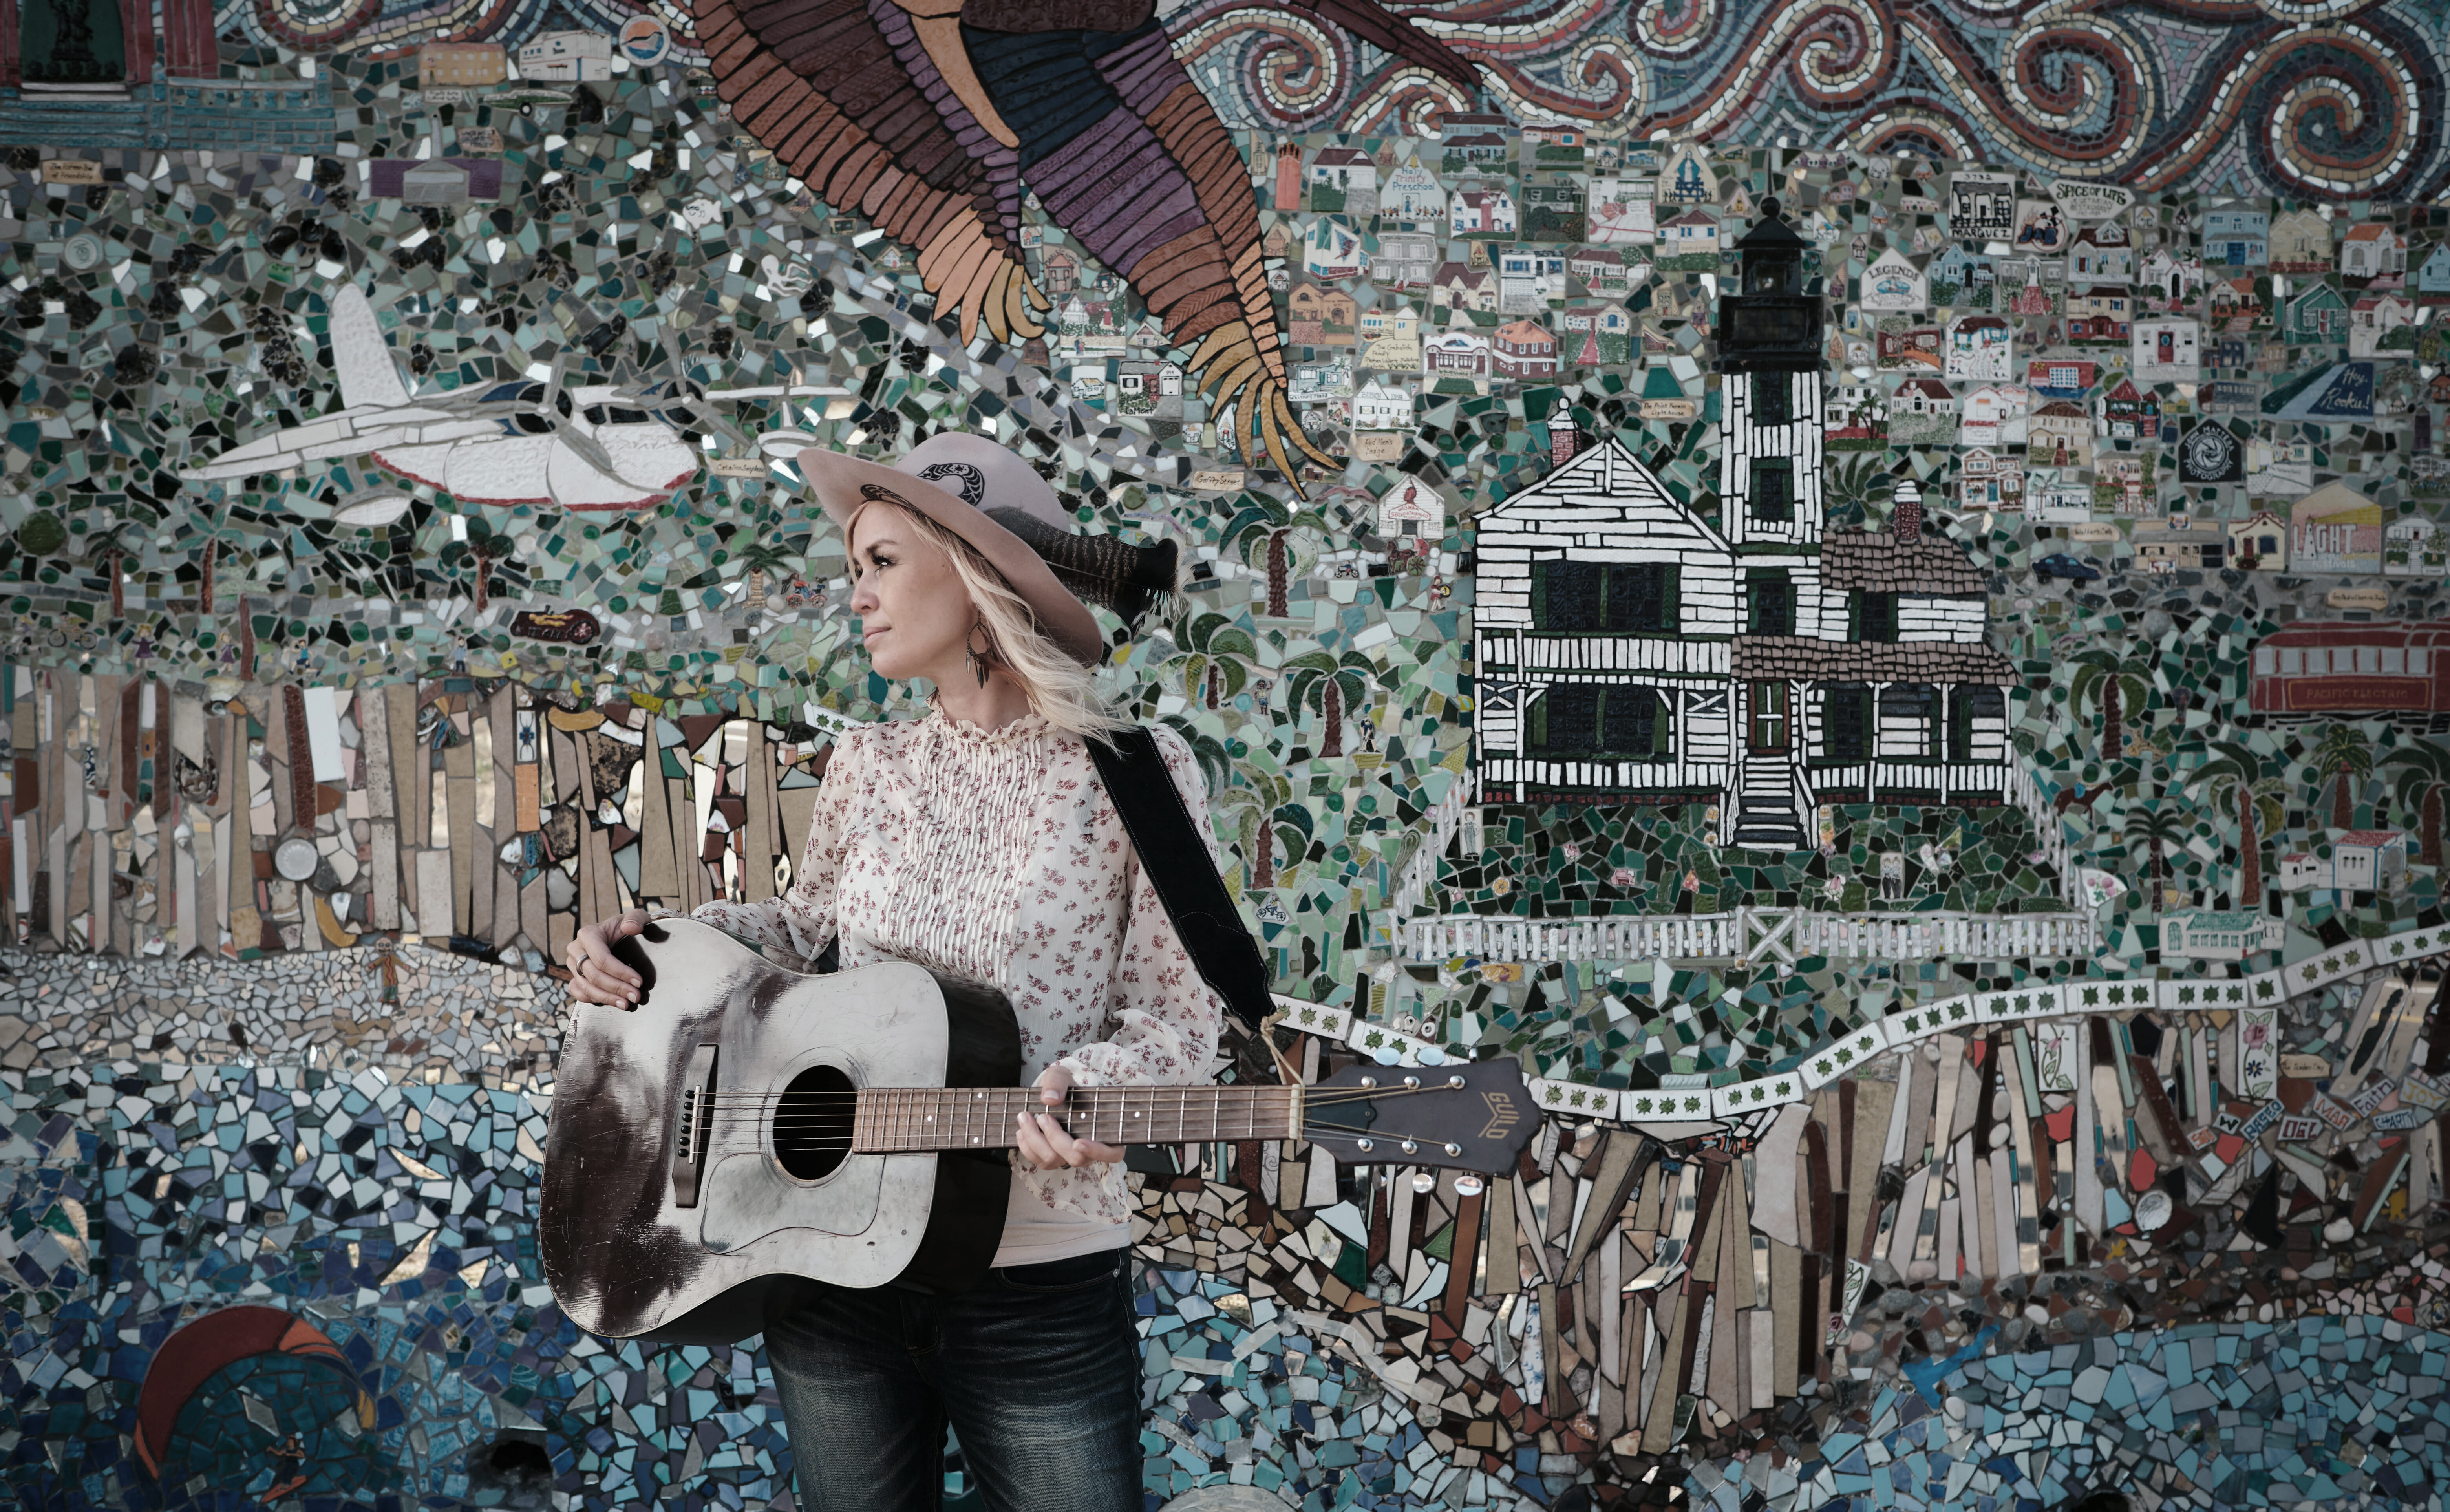 CANCELLED: Guitarist Sofia Talvik